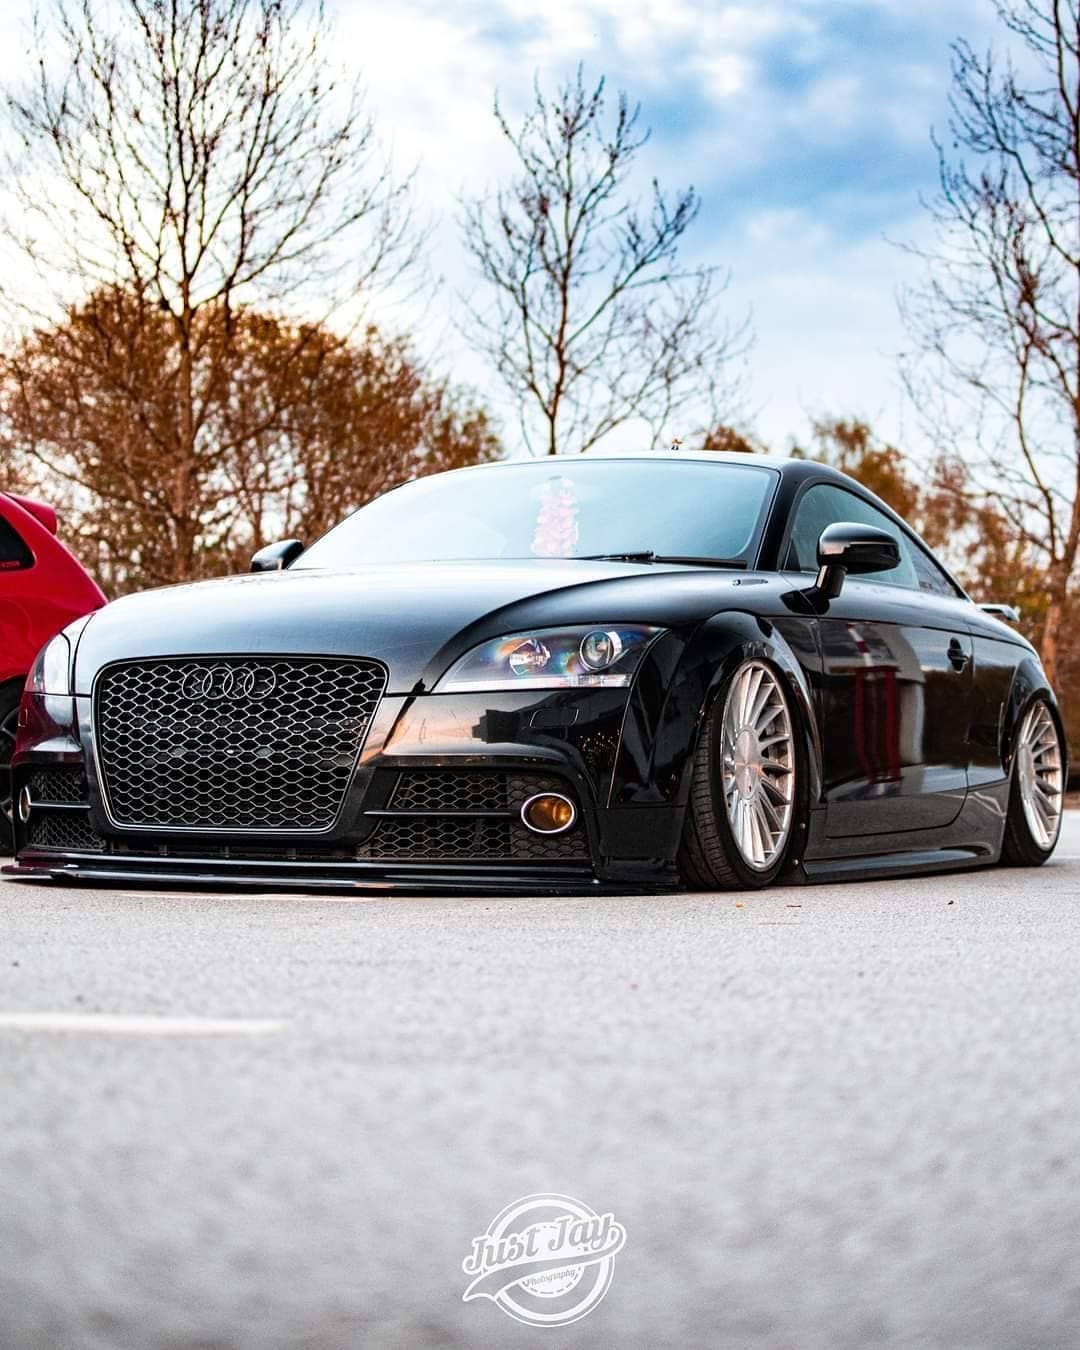 3SDM 0.04 x Audi TT⠀⠀